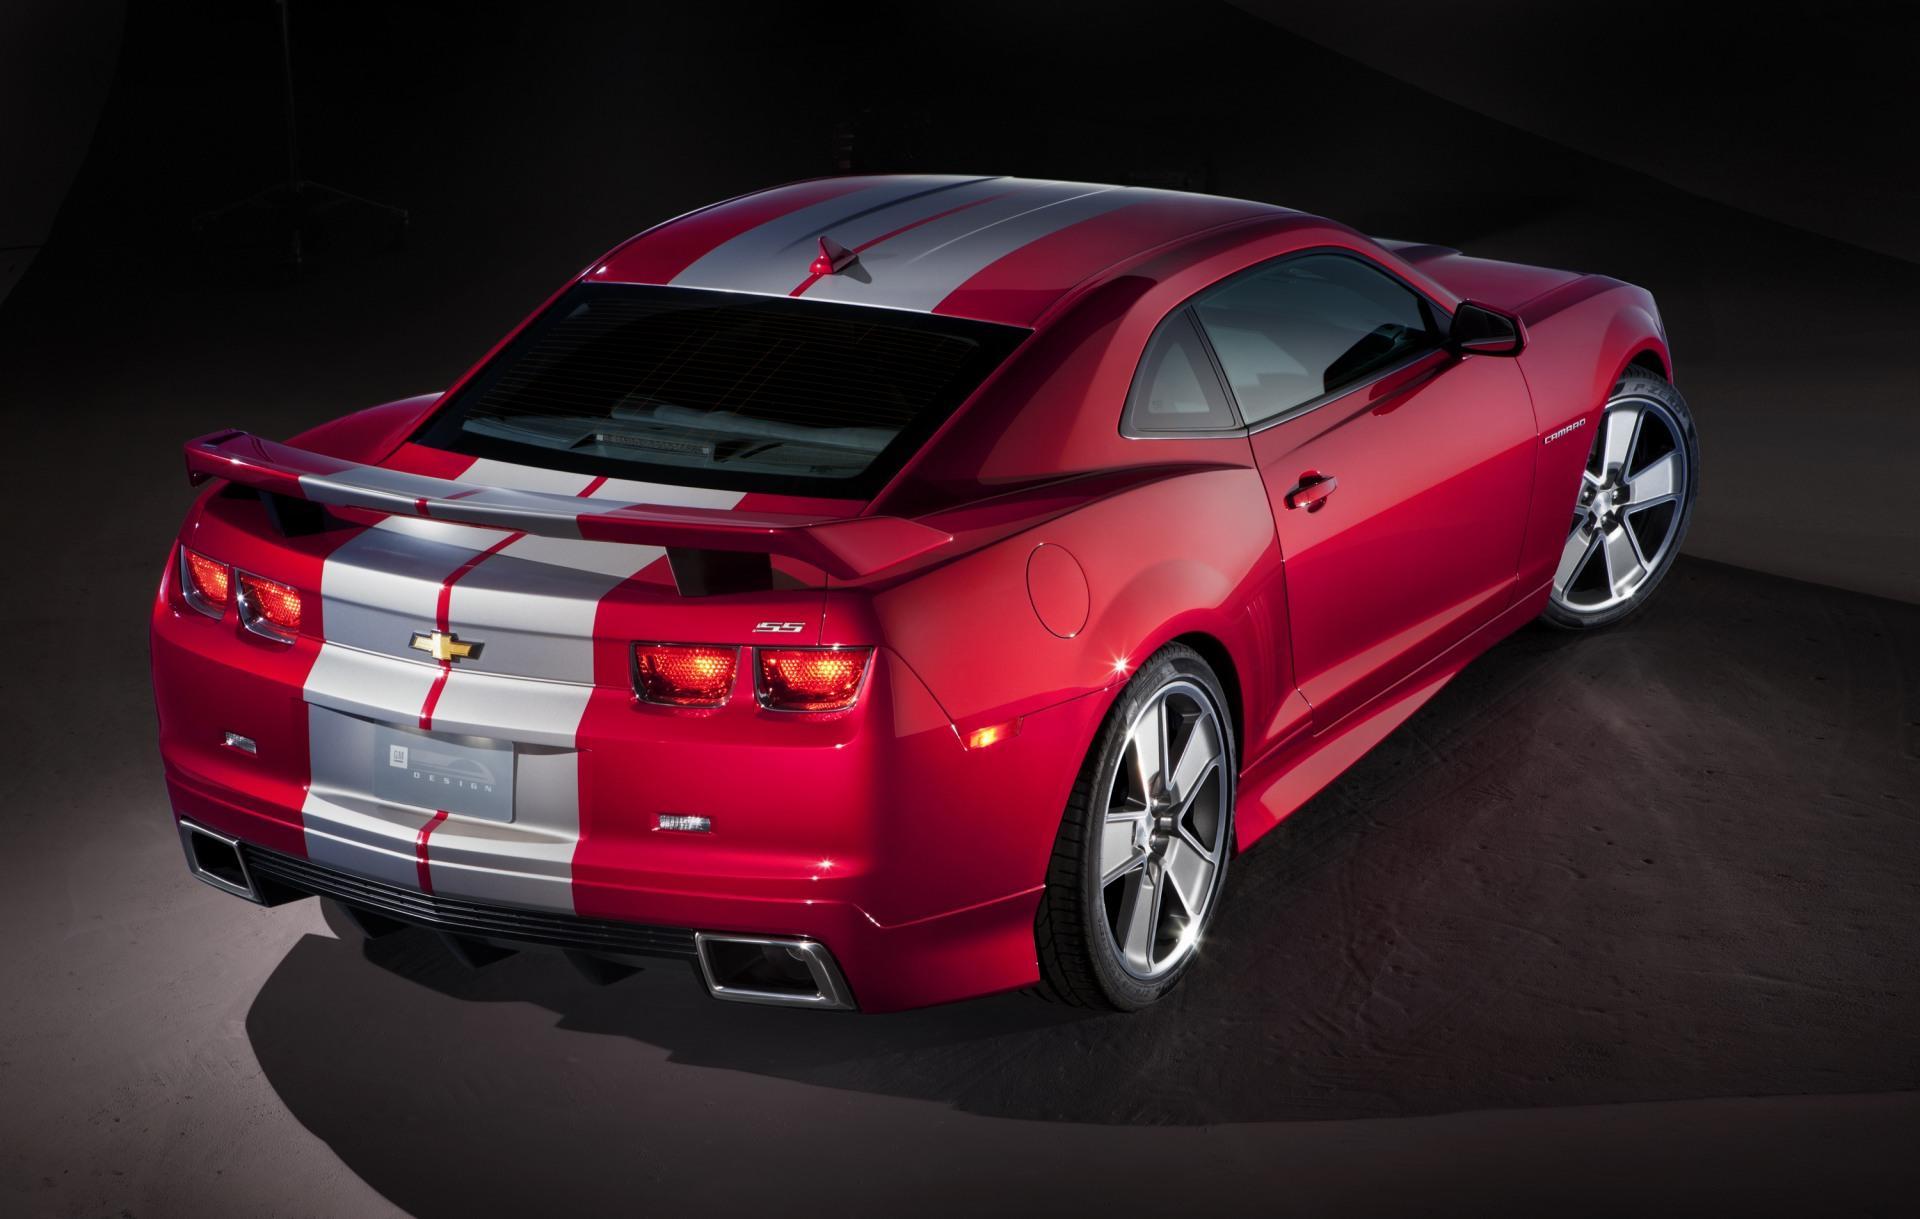 2010 Chevrolet Camaro Red Flash